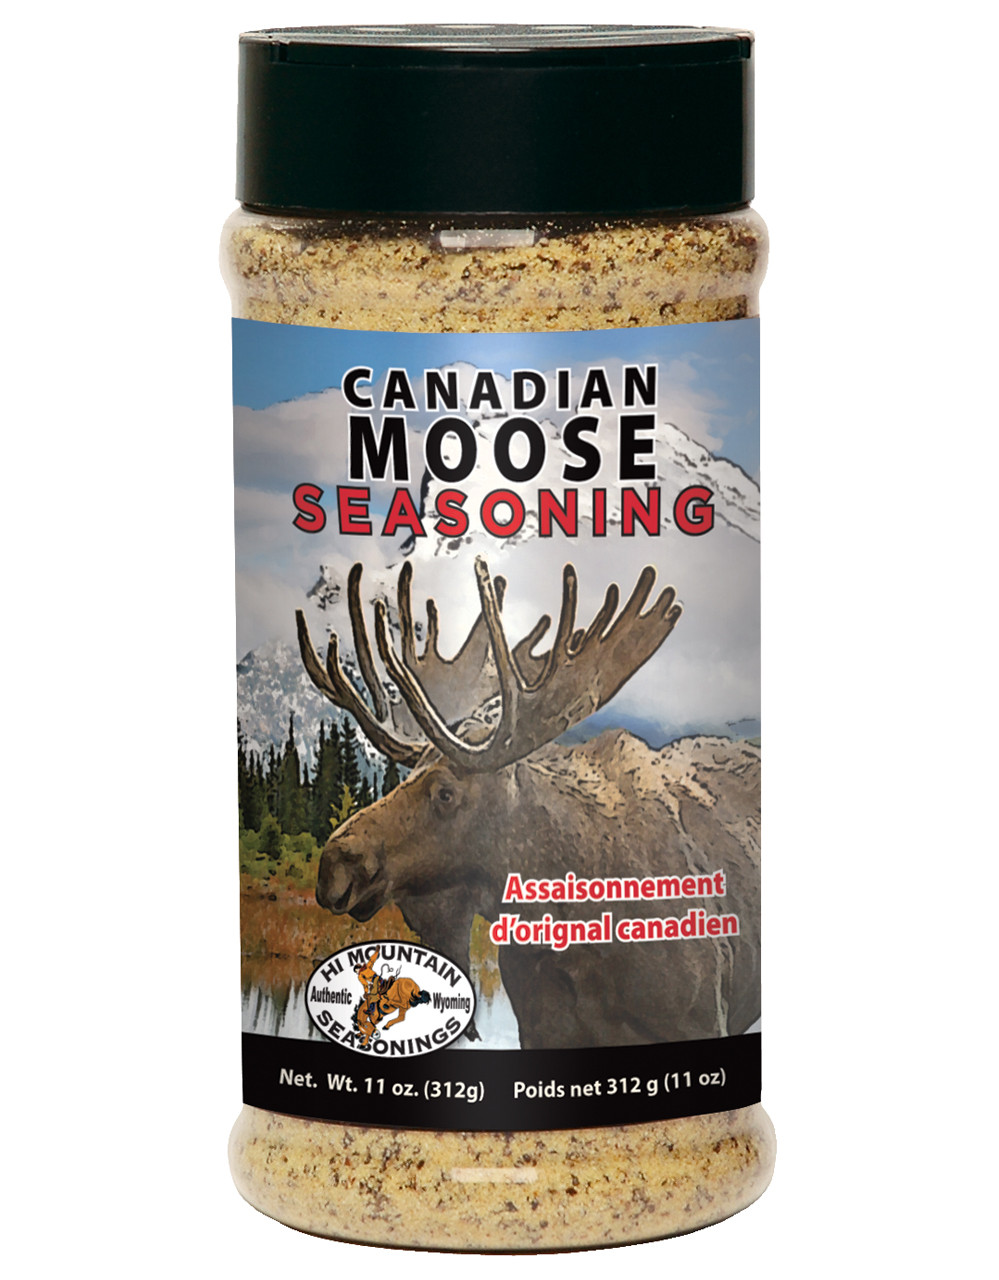 Canadian Moose Seasoning